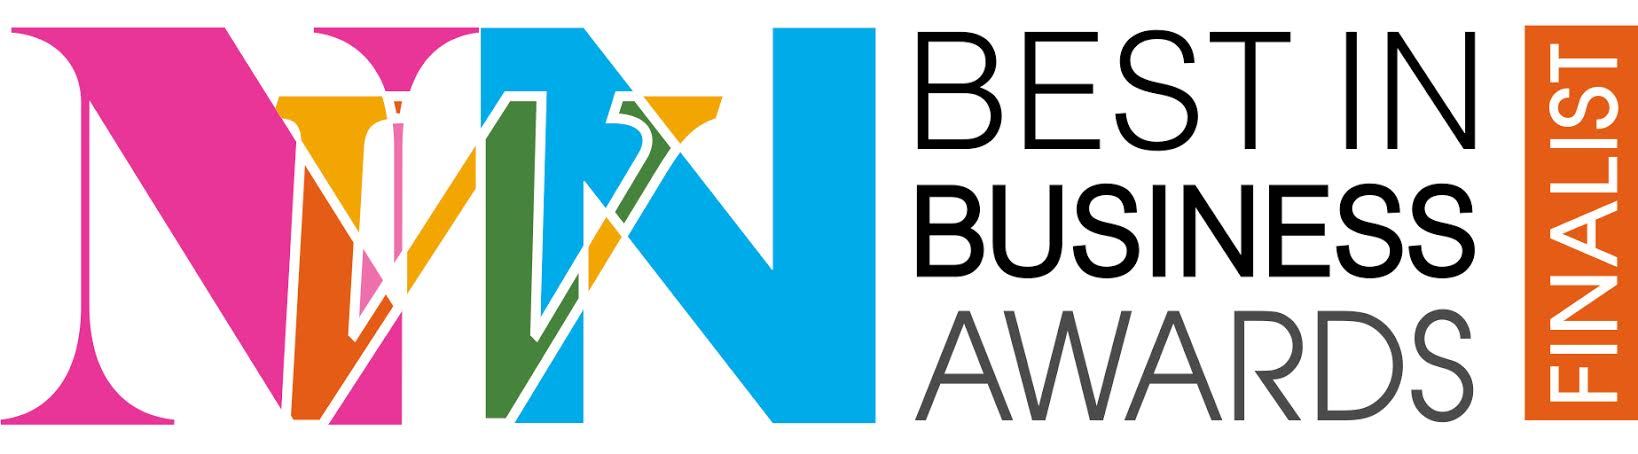 NewburyWeeklyNews_BestIn_Business_Awards.jpg